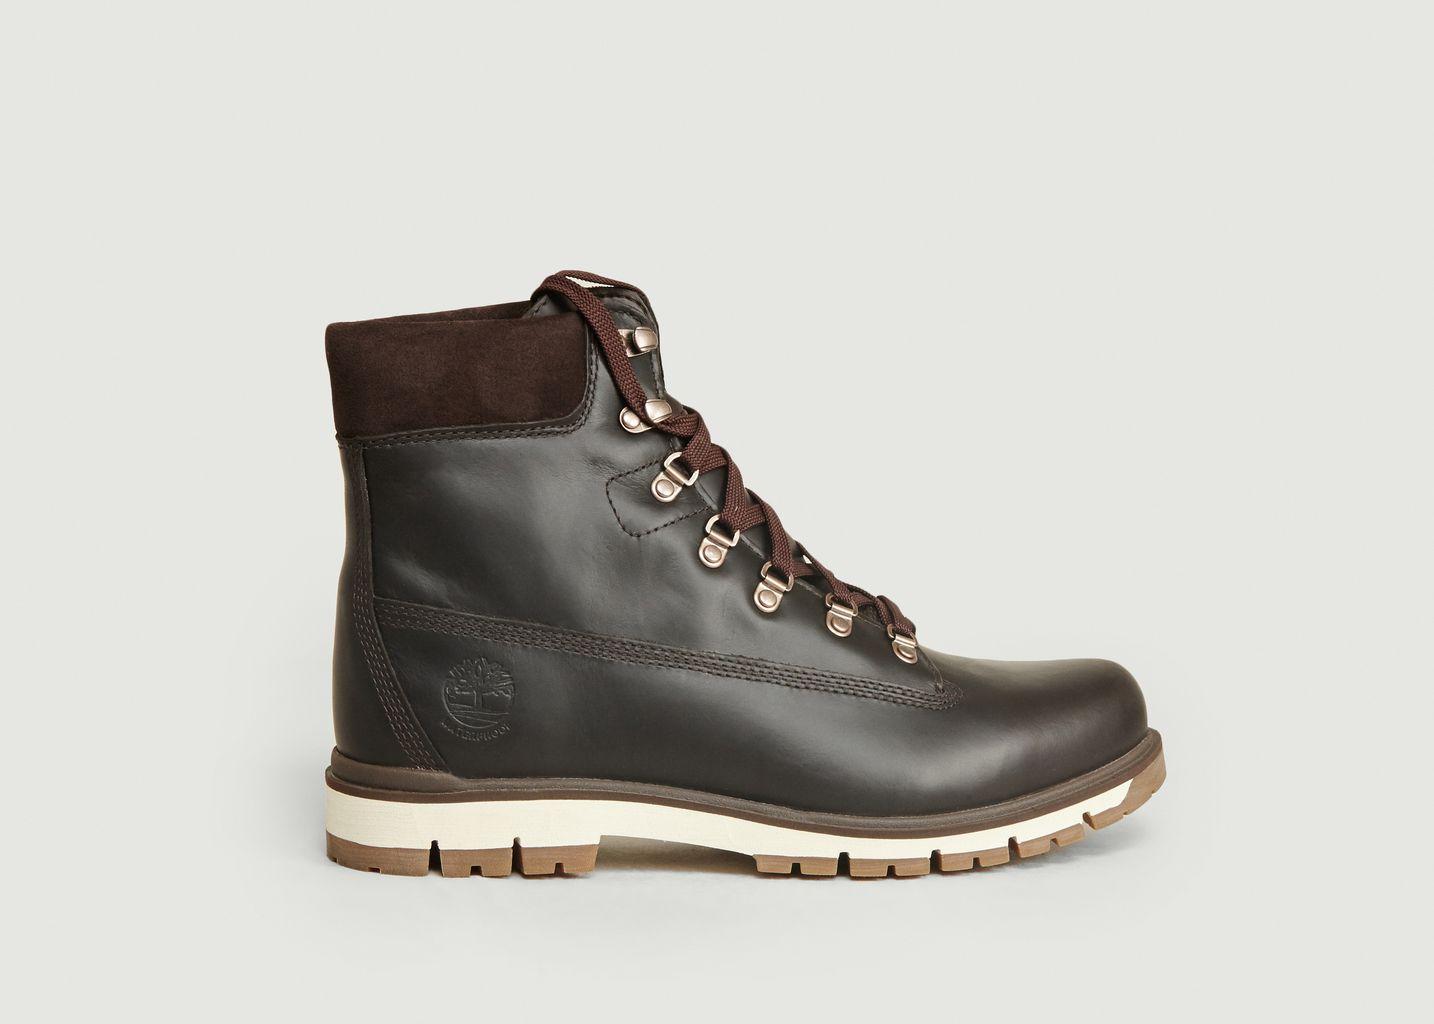 Boots Ratford Alpine - Timberland